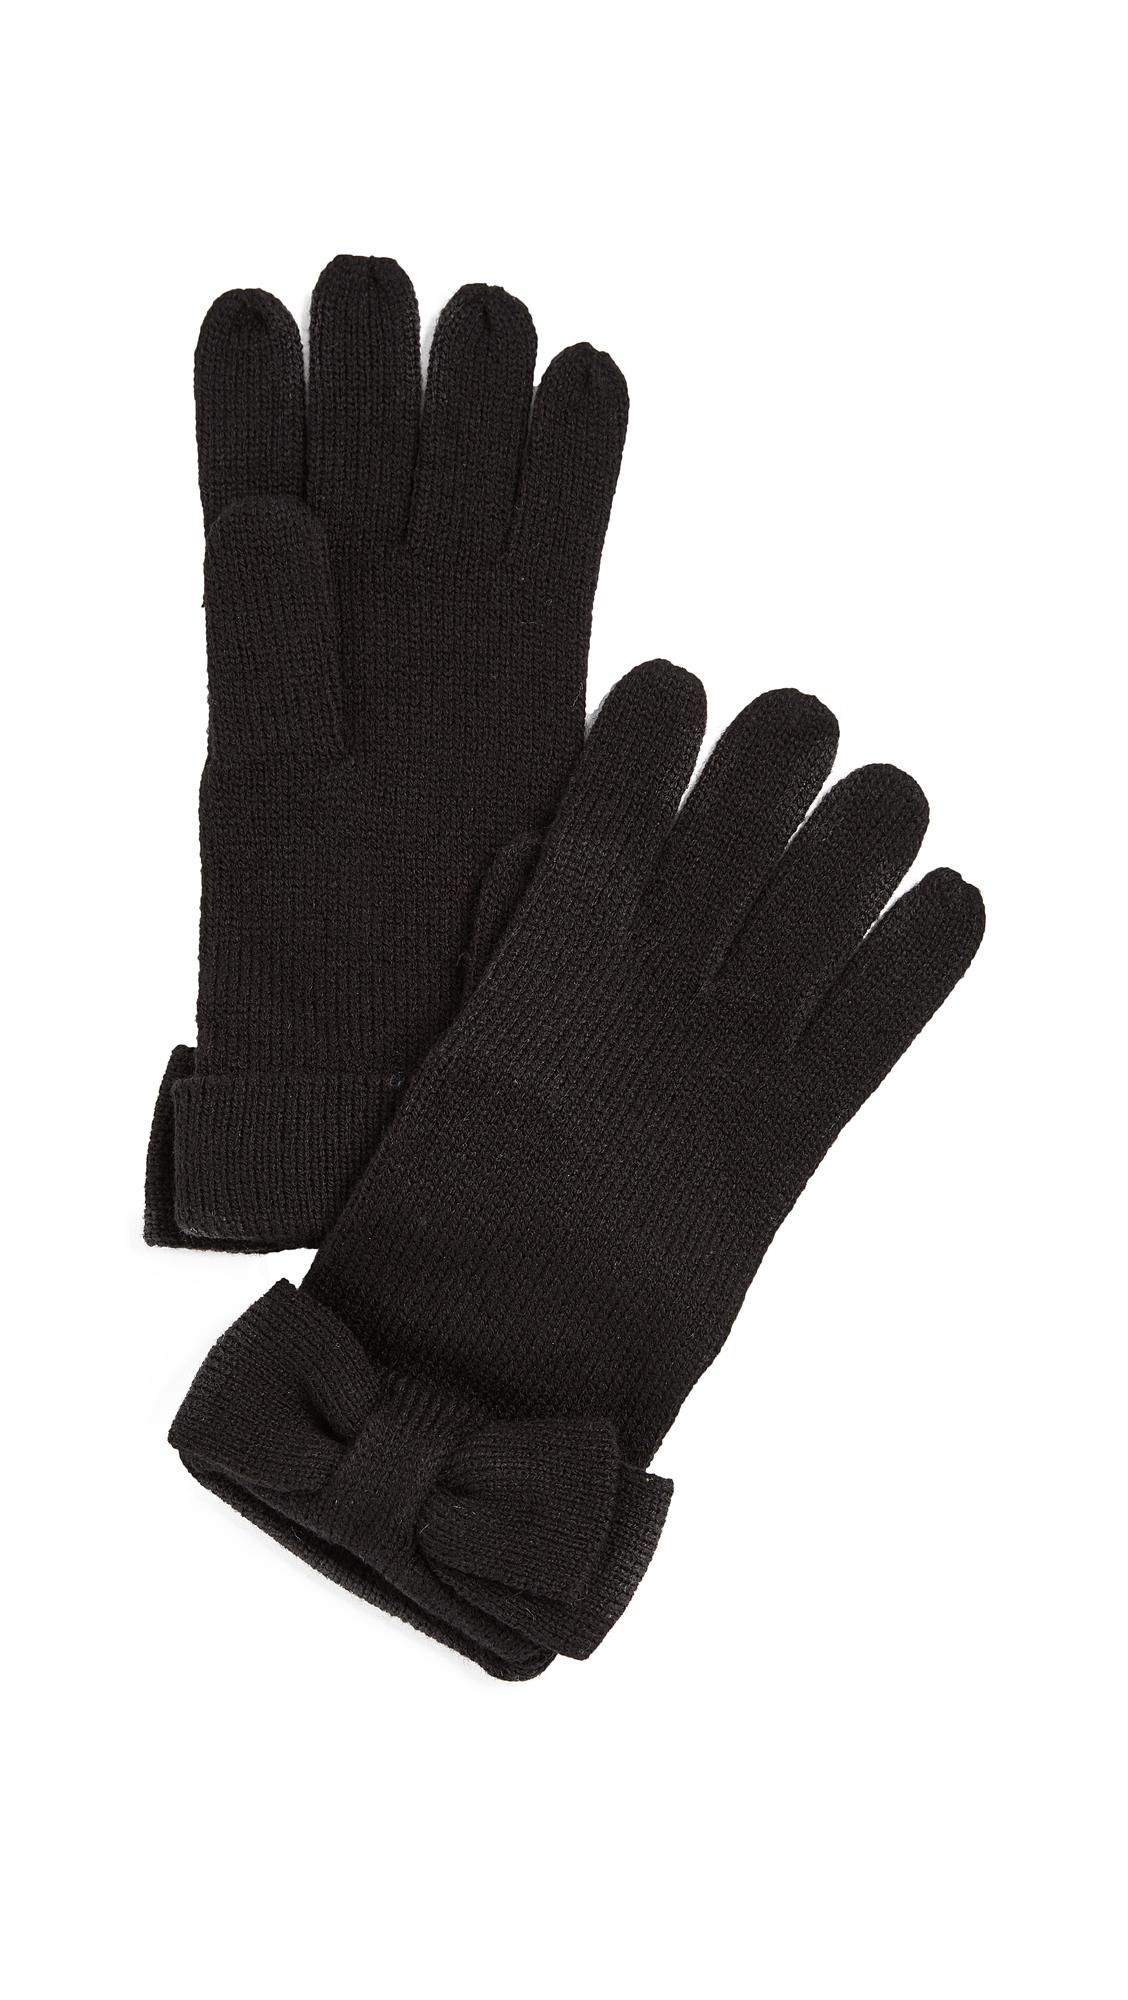 Kate Spade New York Half Bow Gloves - Black